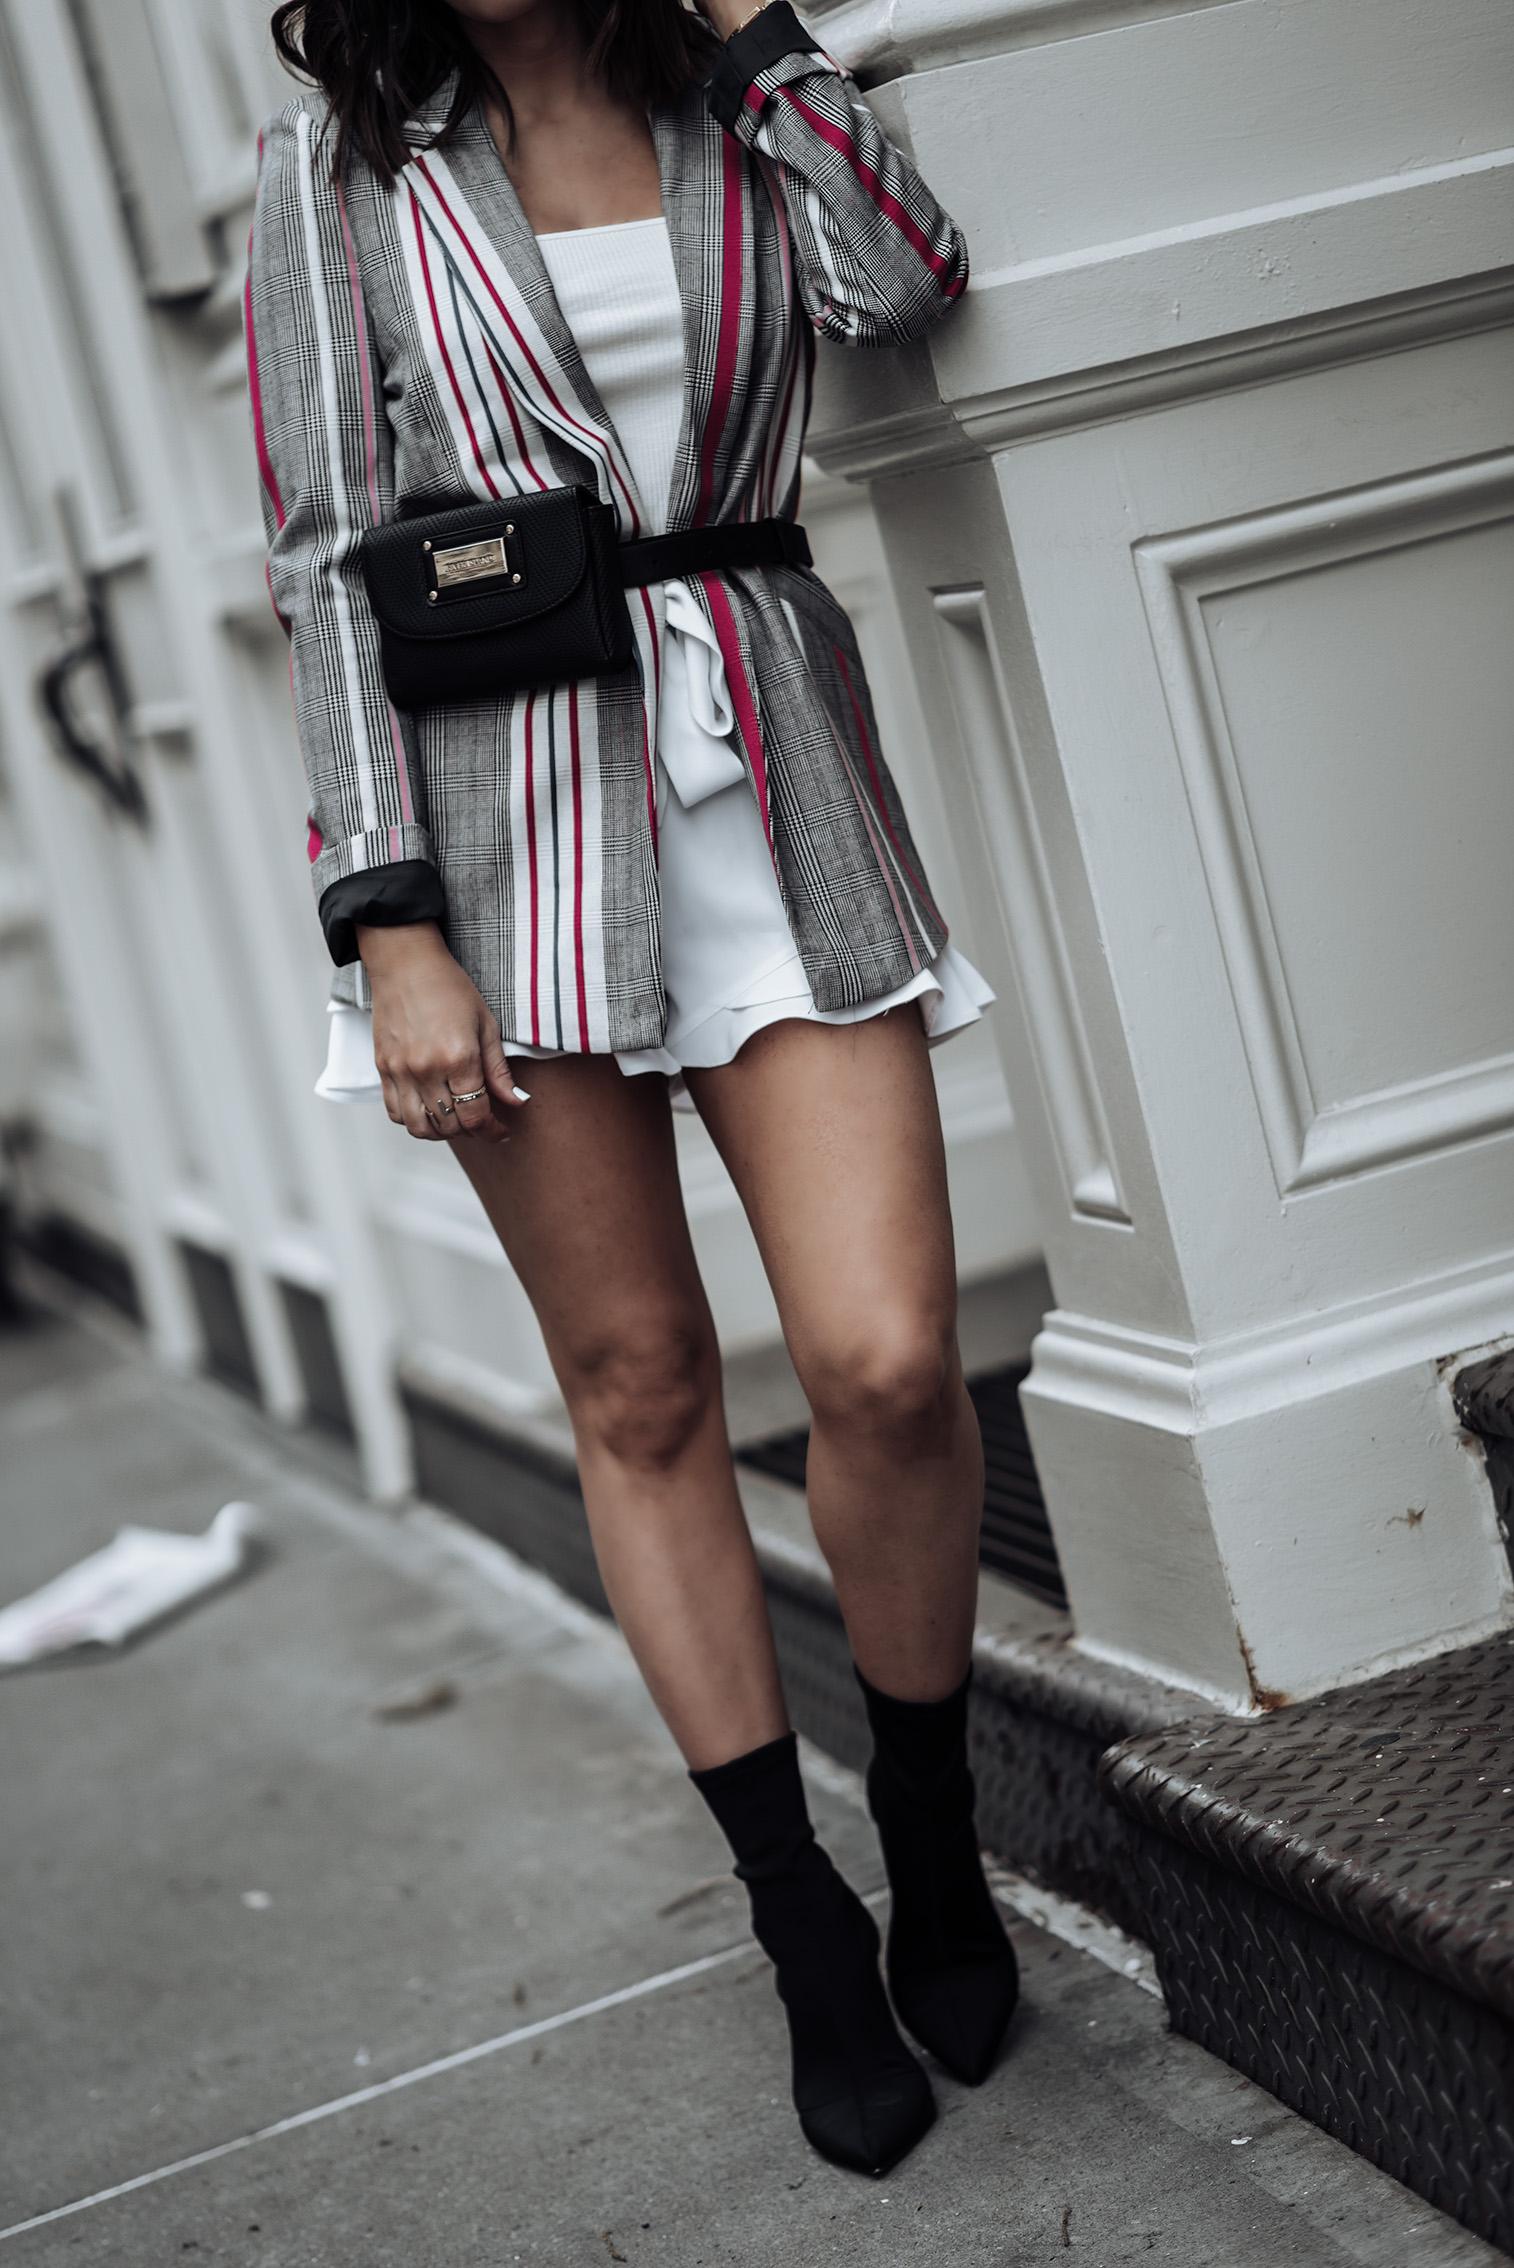 River Island Chic |Striped Blazer | White Frill Shorts | #liketkit #riverisland #anklesockboots #bumbag